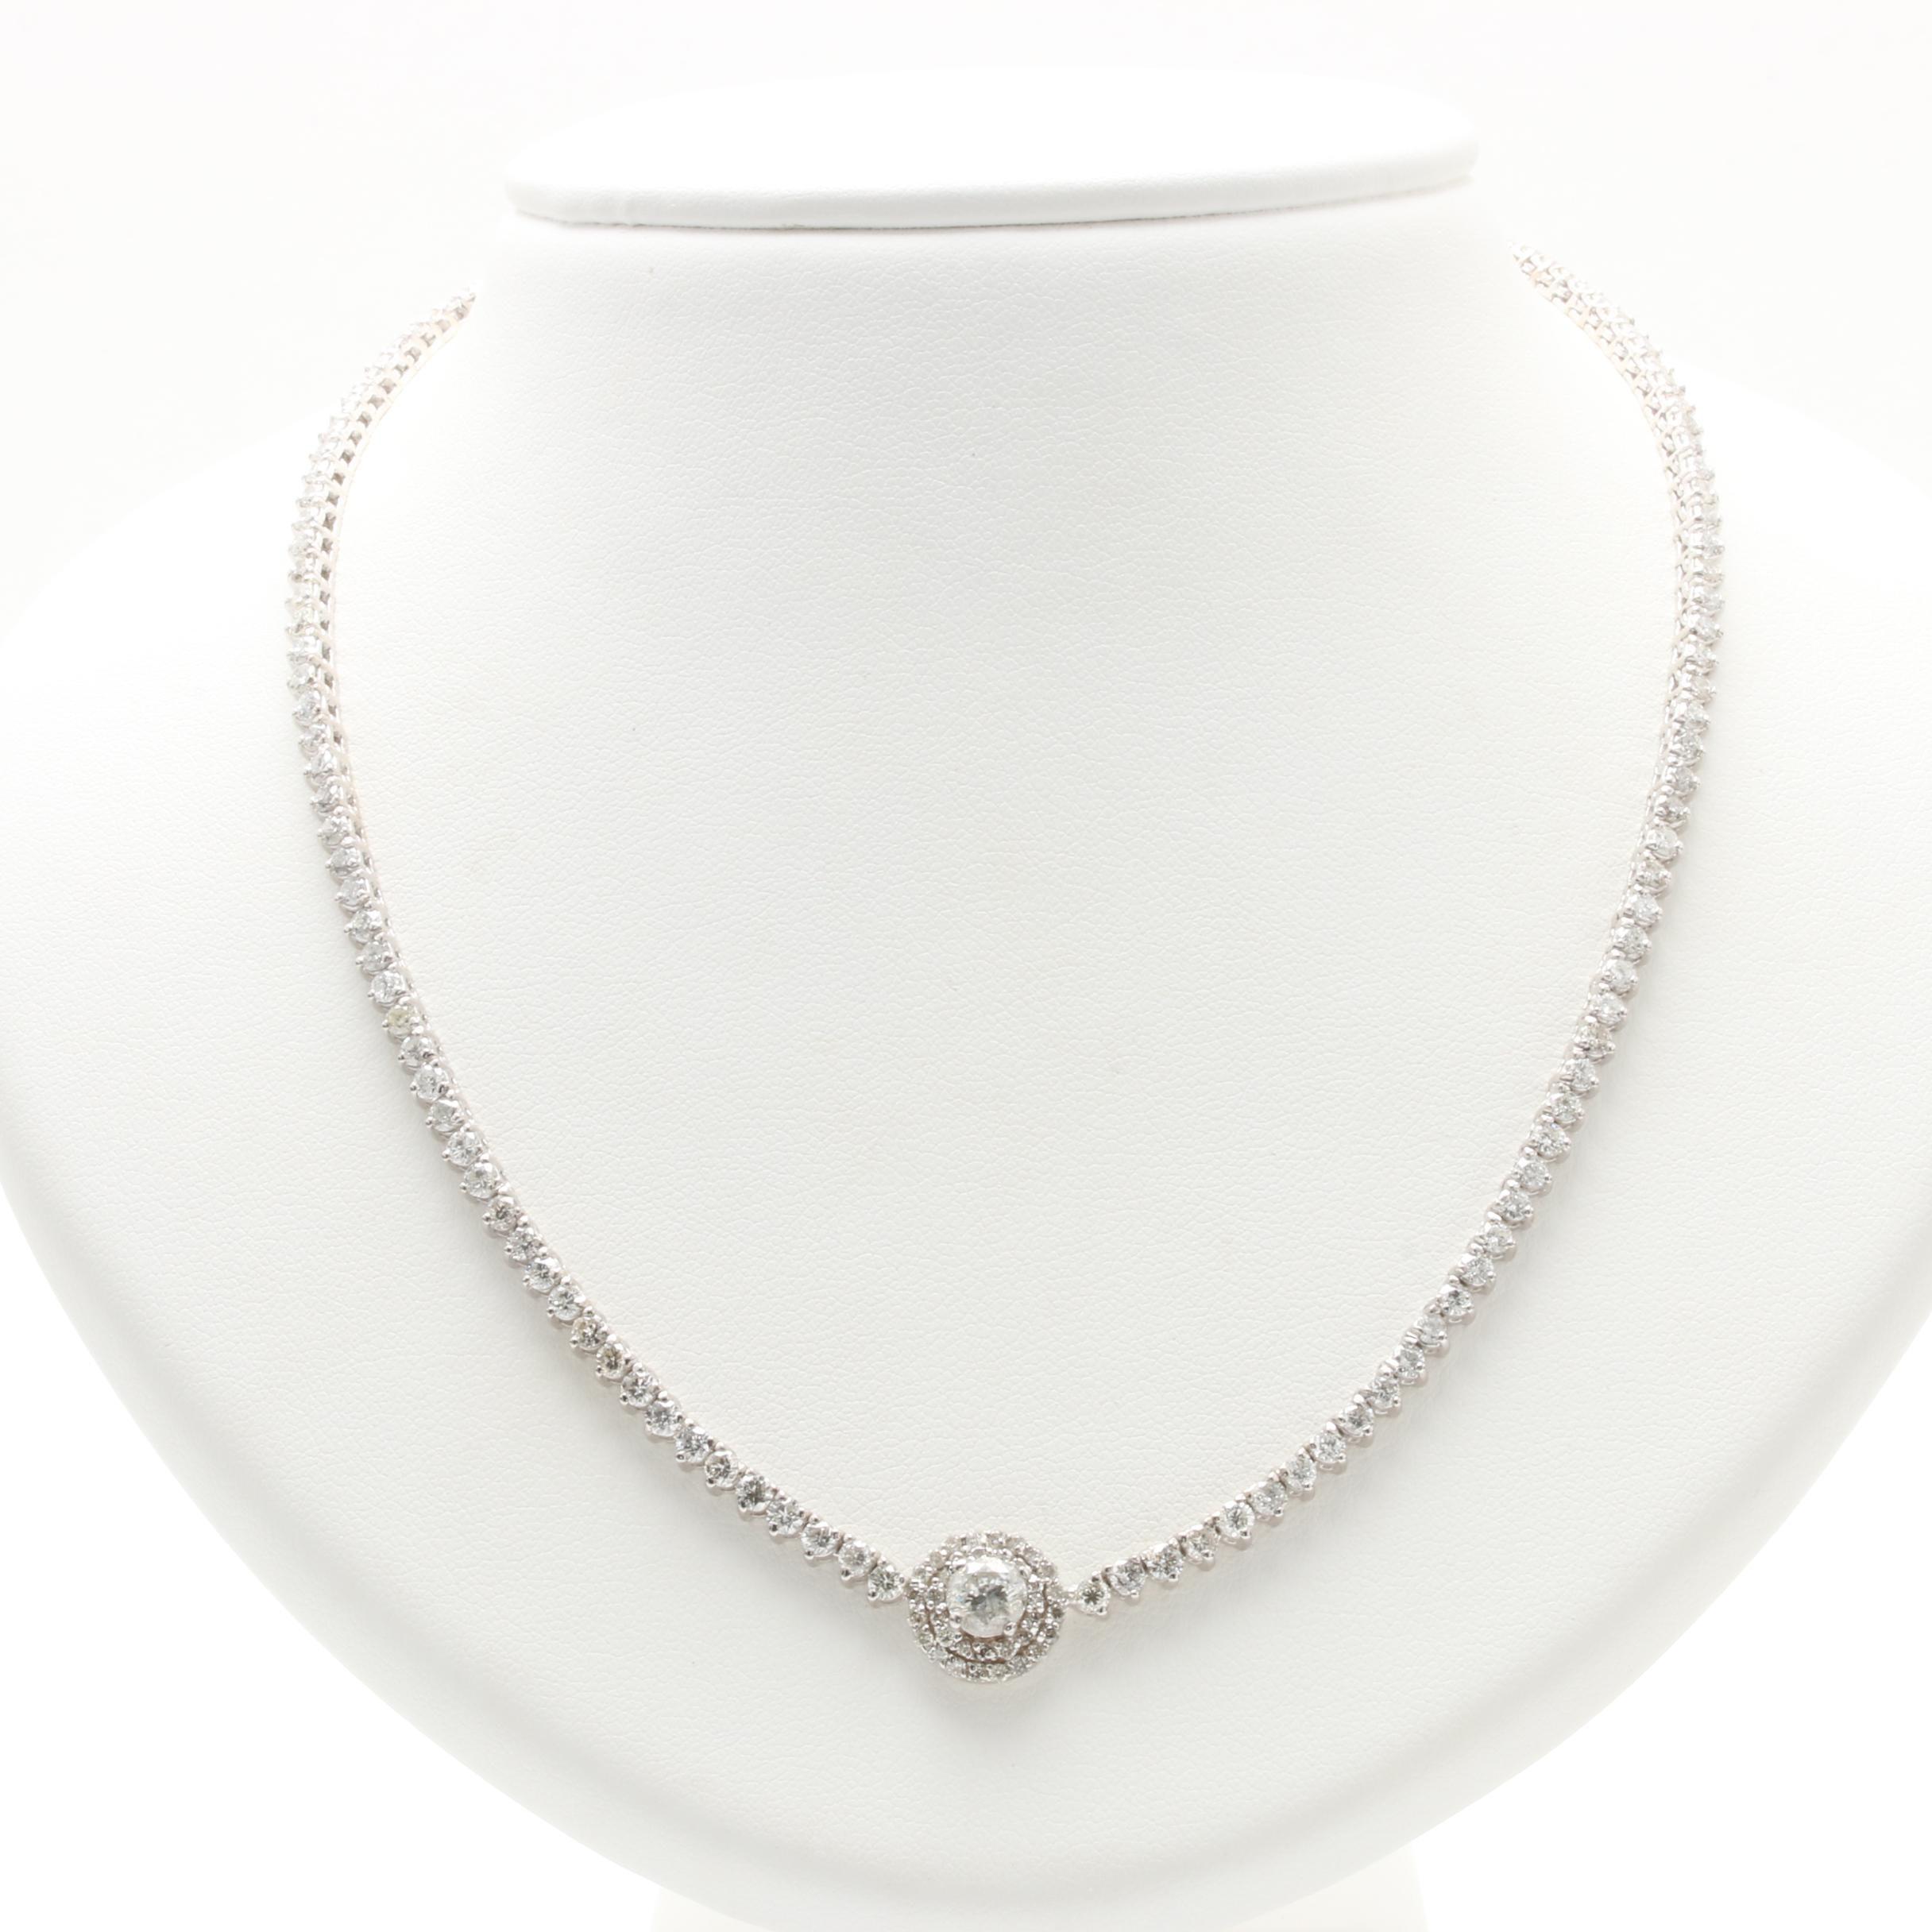 14K White Gold 6.60 CTW Diamond Necklace